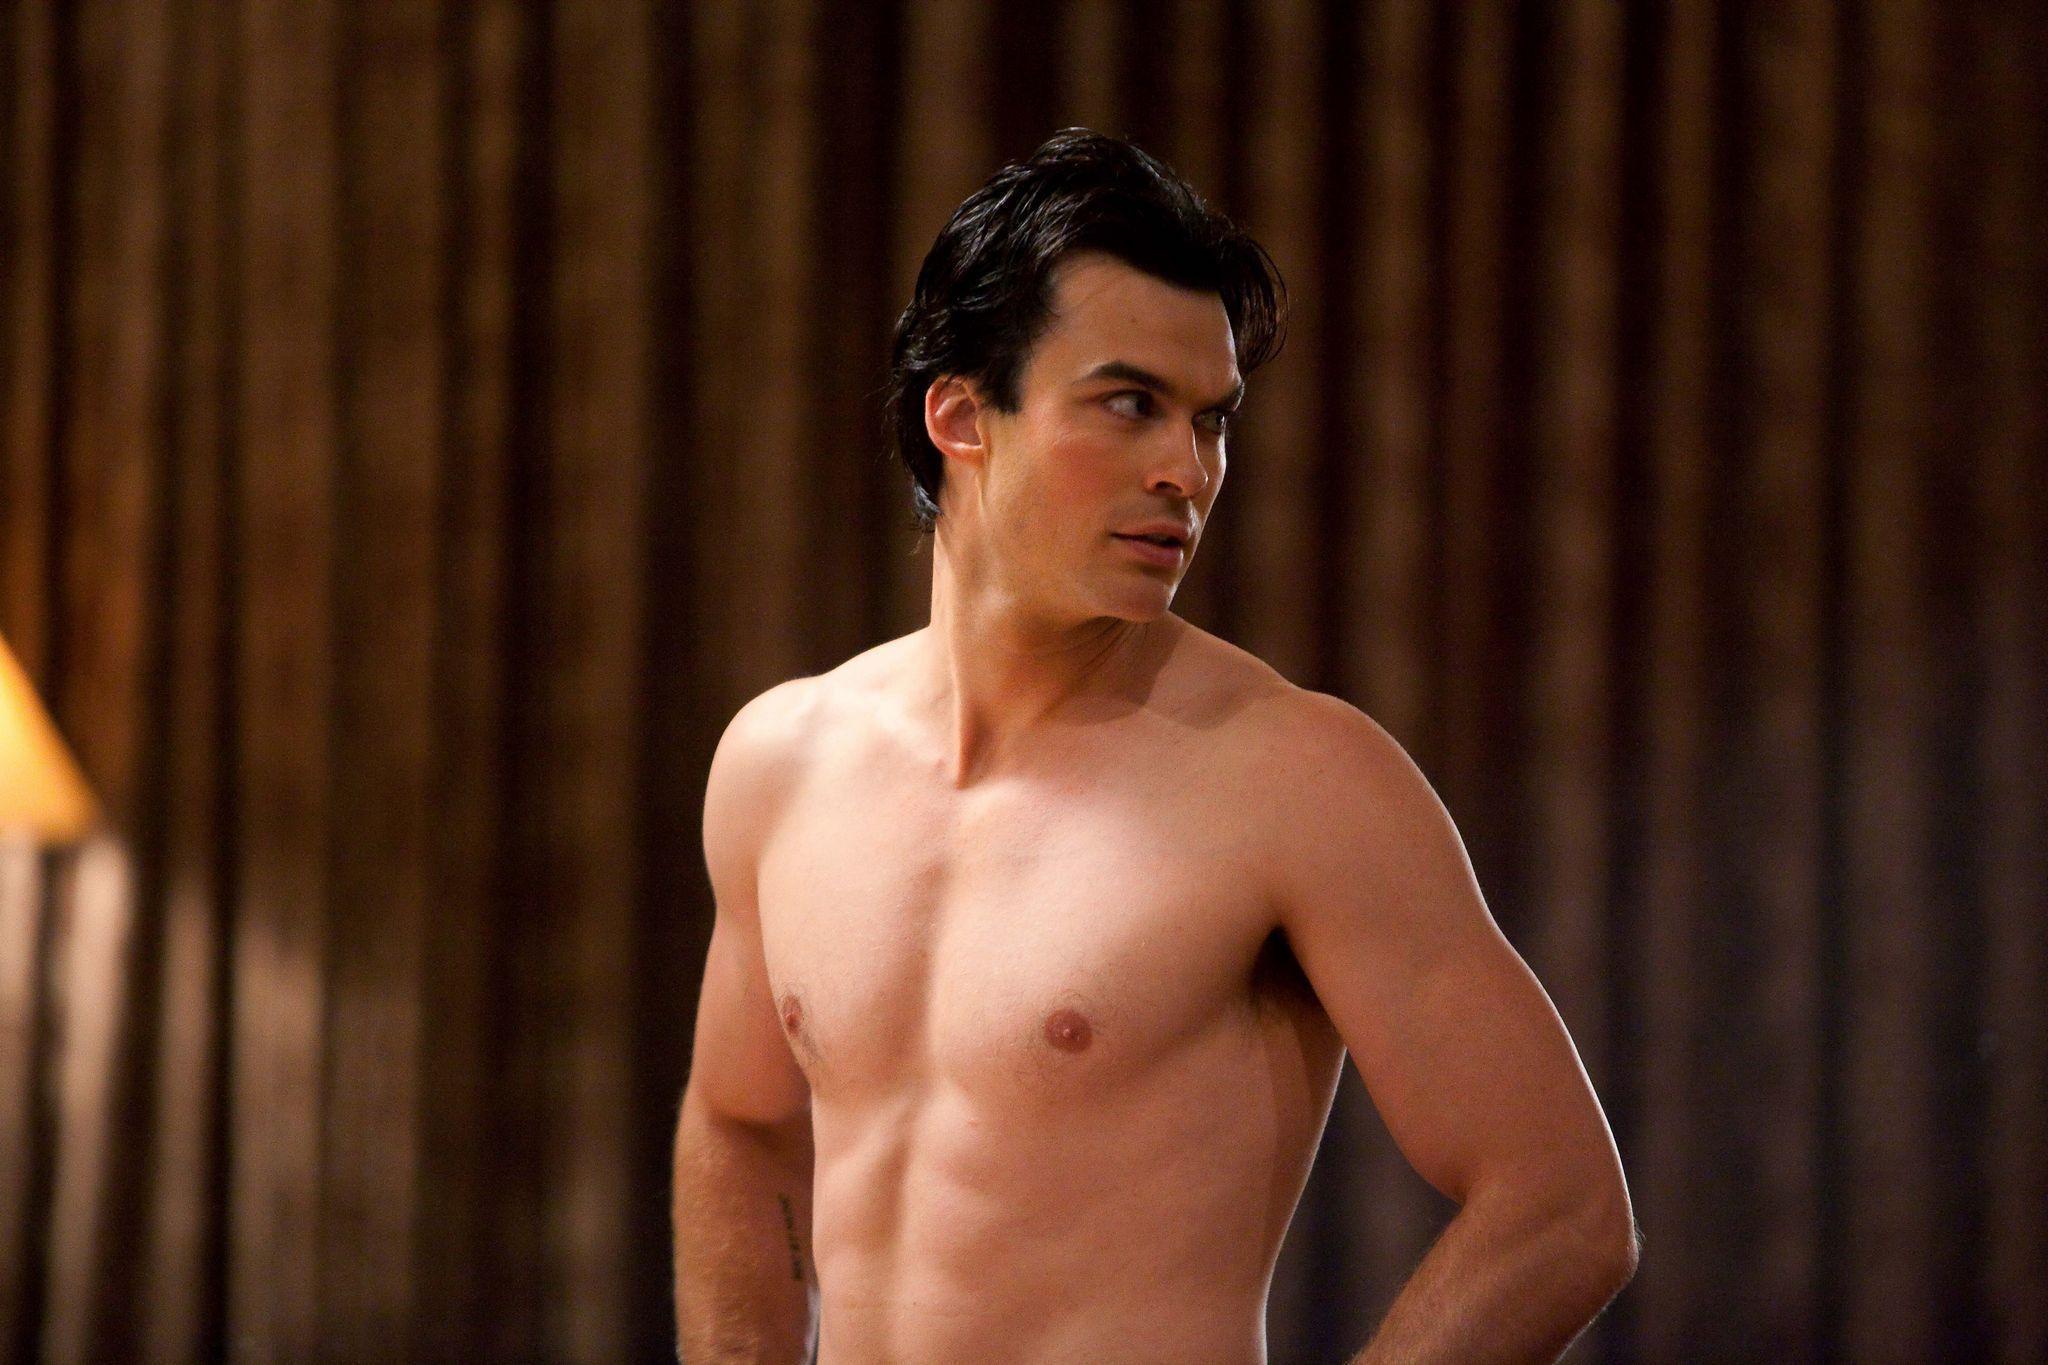 Tvdrocks Images Damon Salvatore Shirtless Hd Fond Décran And